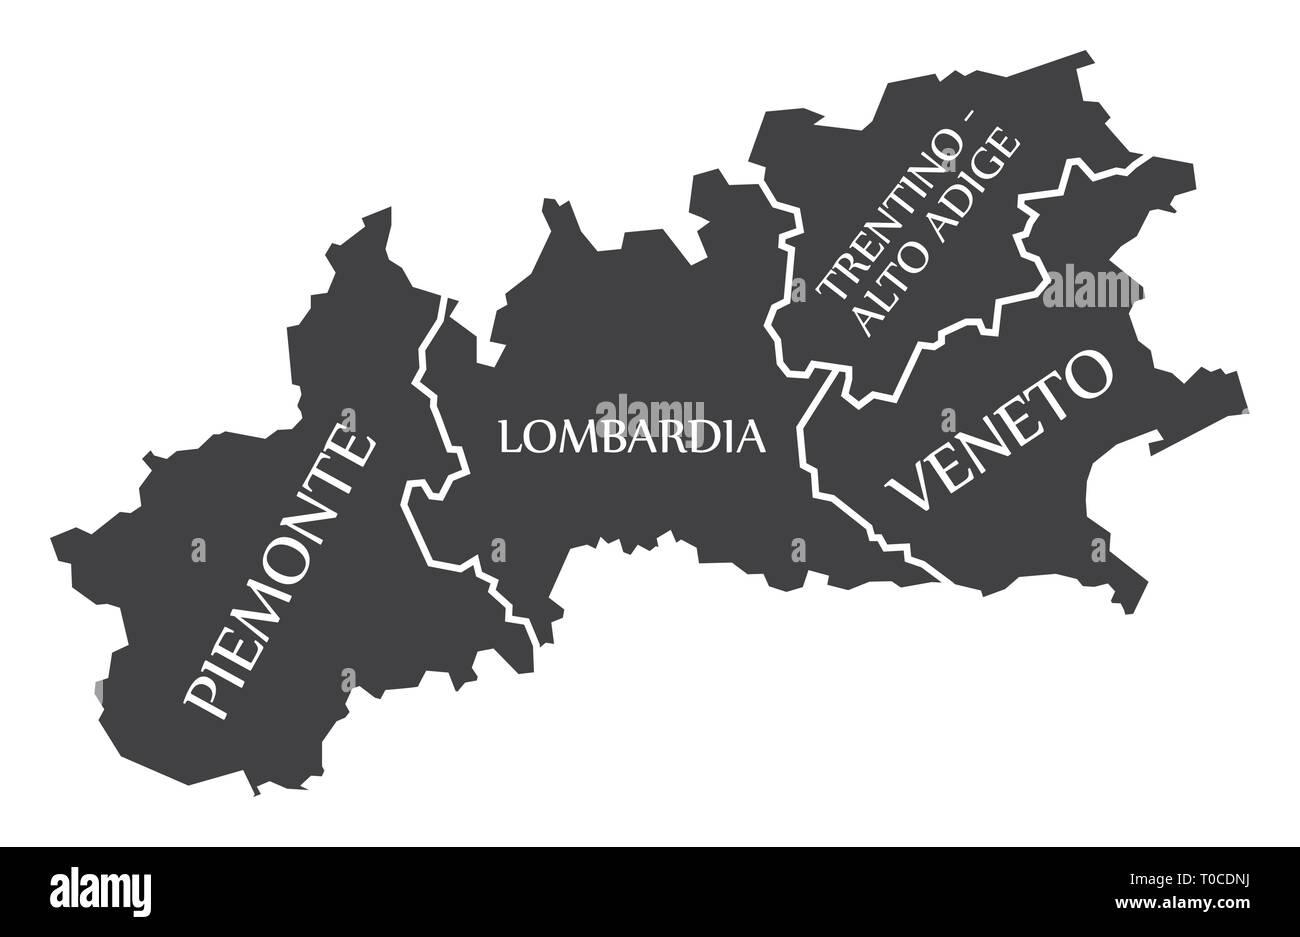 Piemonte Lombardia Trentino Alto Adige Veneto Region